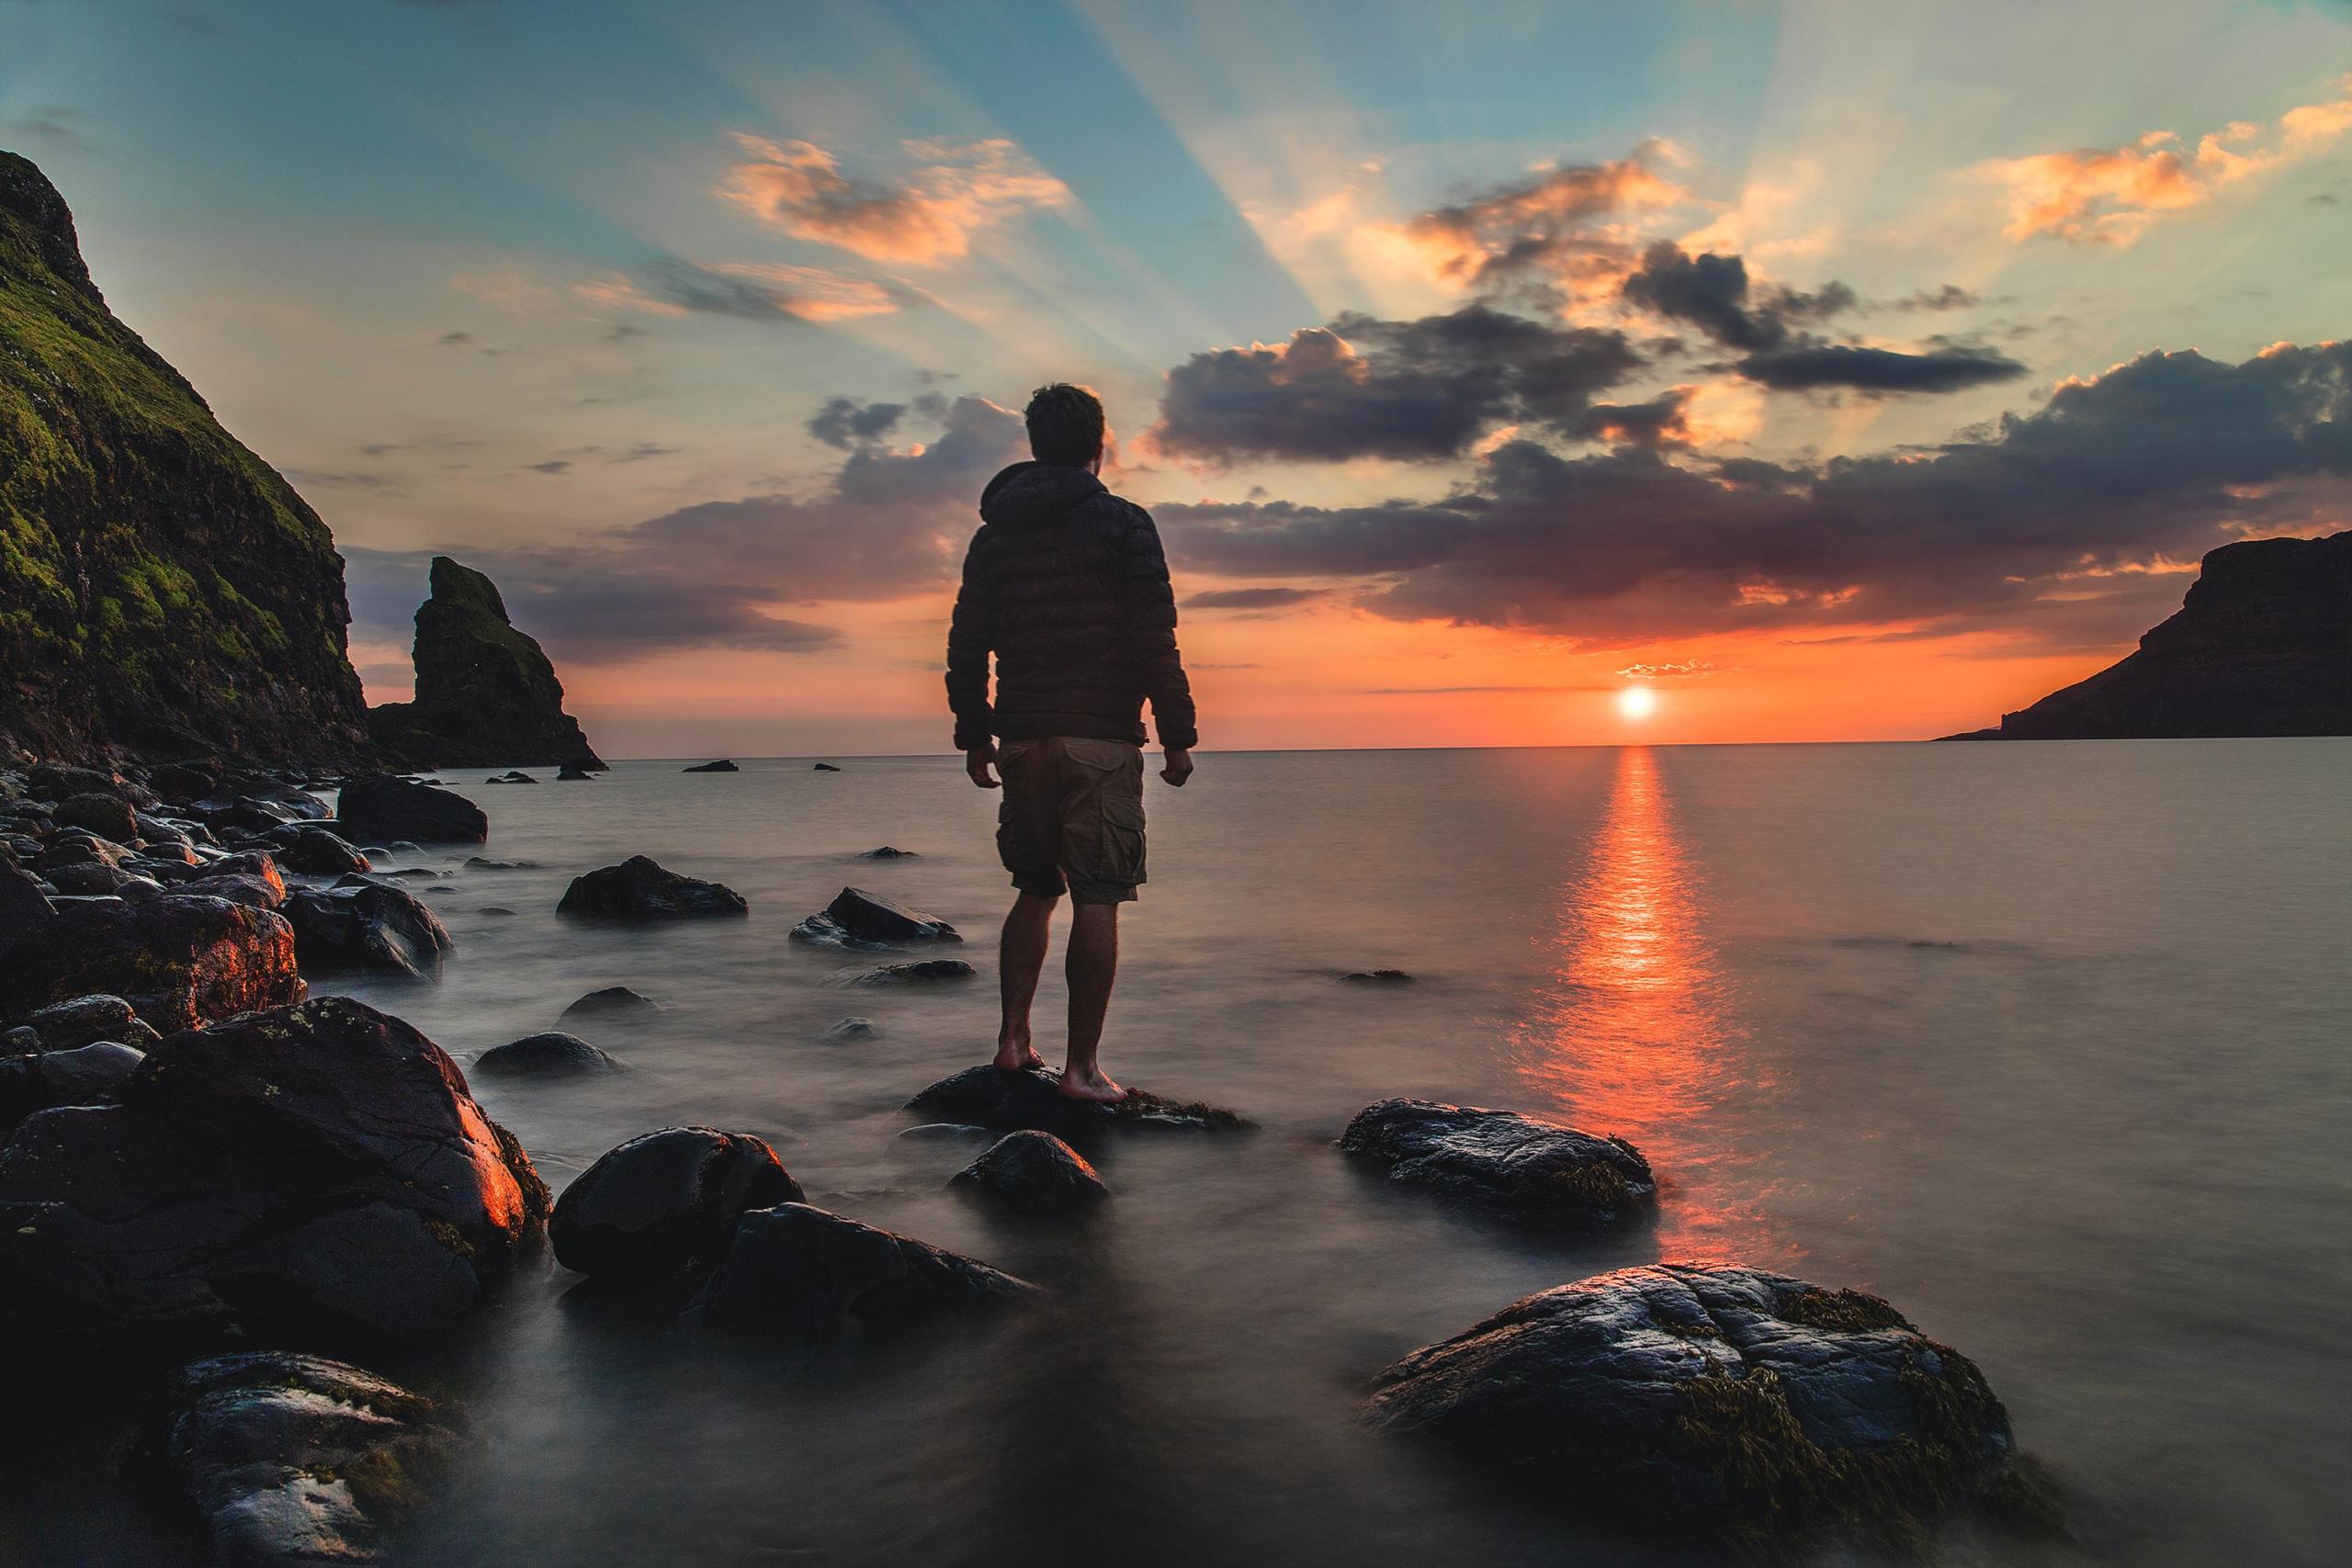 man at sunset on rock